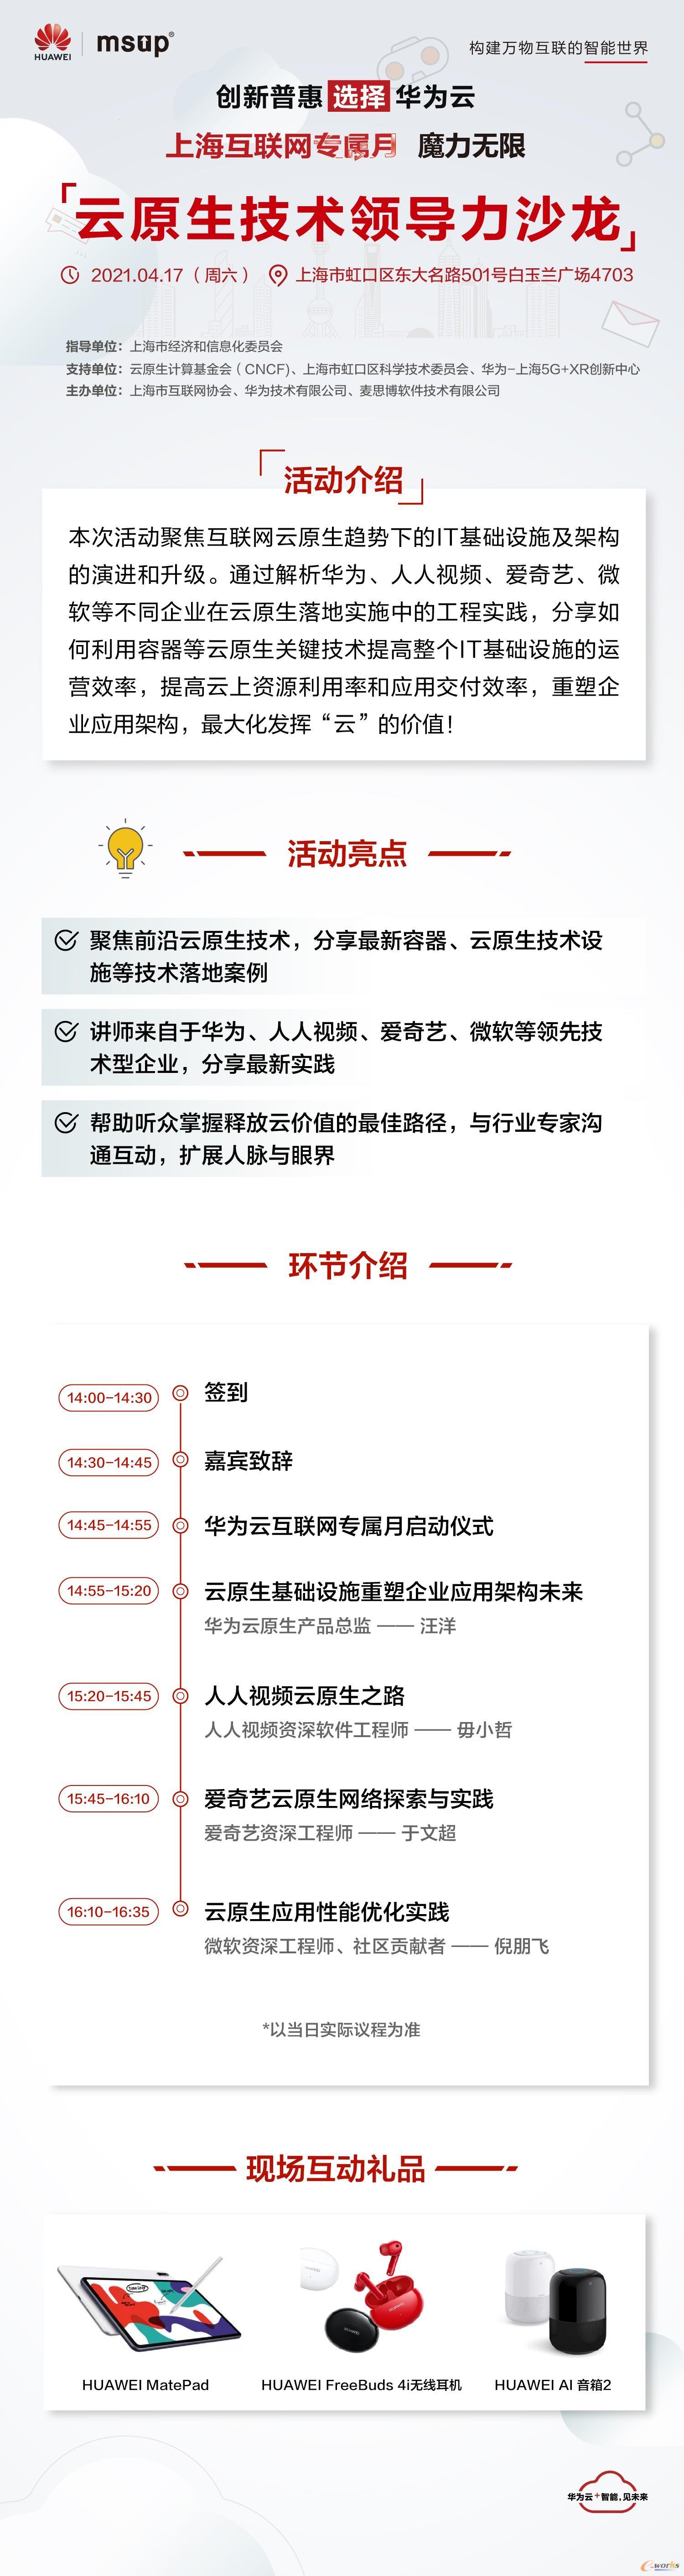 http://www.e-works.net.cn/News/articleimage/20214/132629263304987548_new.jpg